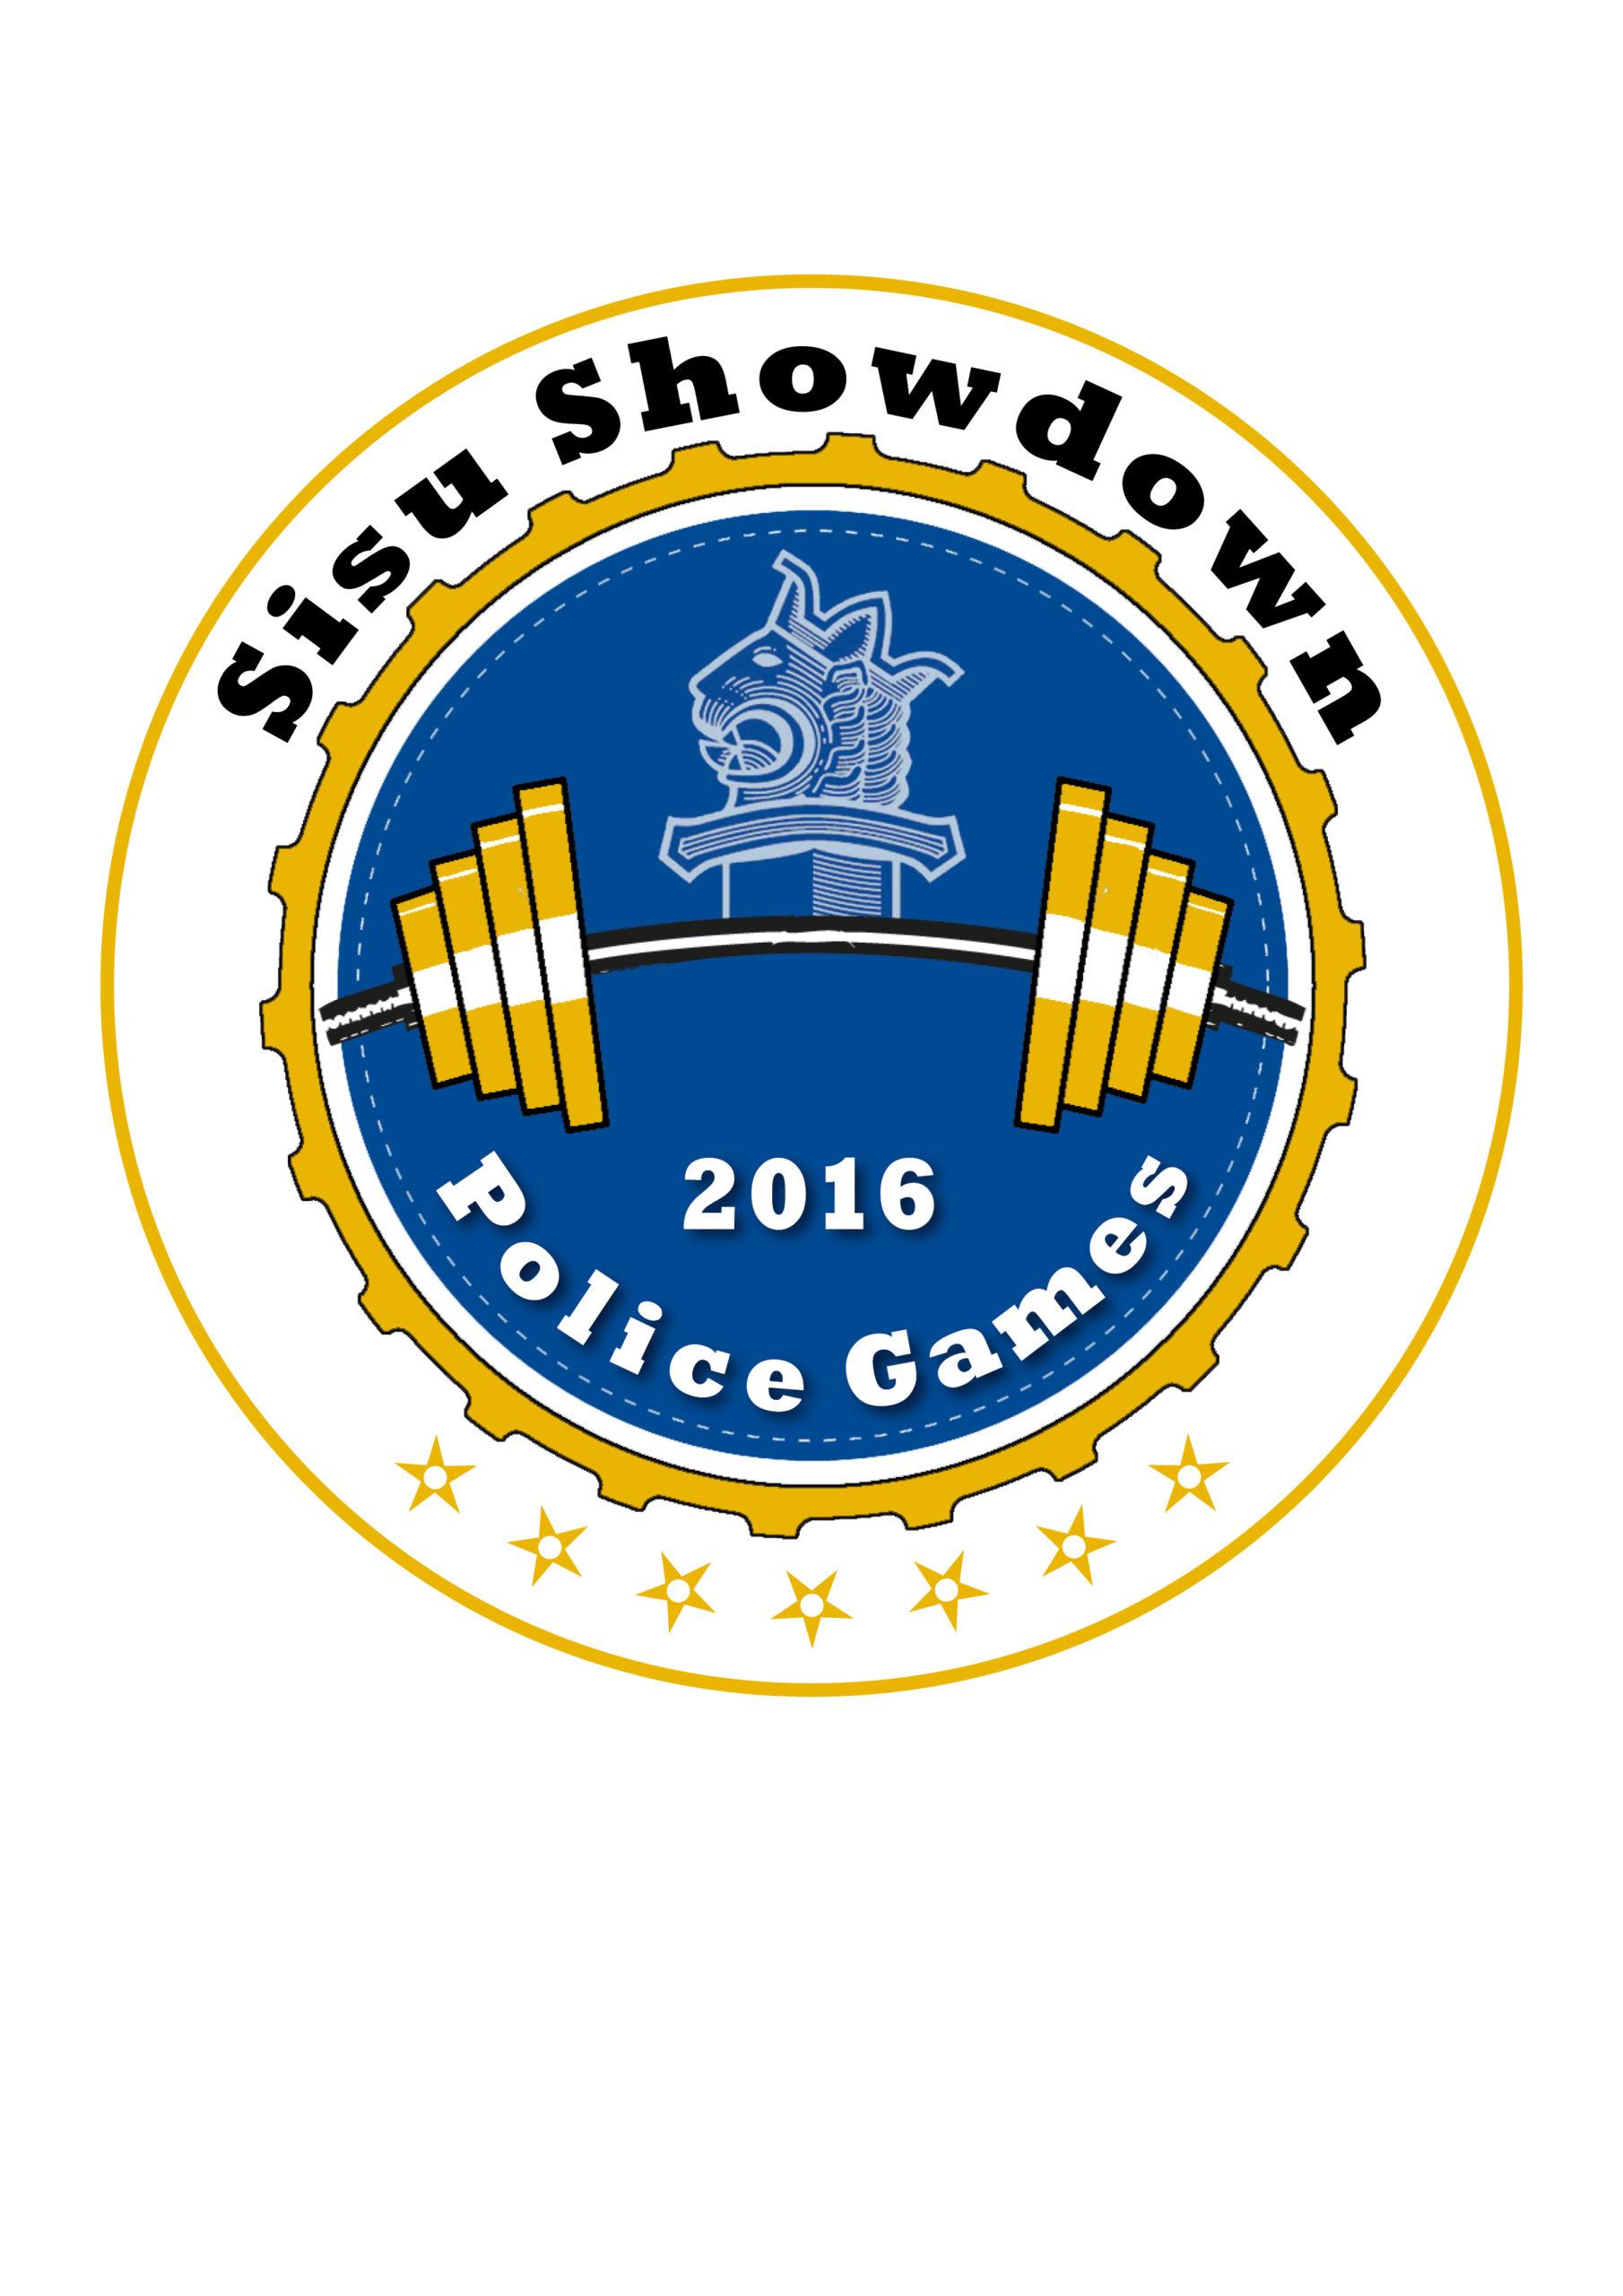 Police Games 2016 – Sisu Showdown